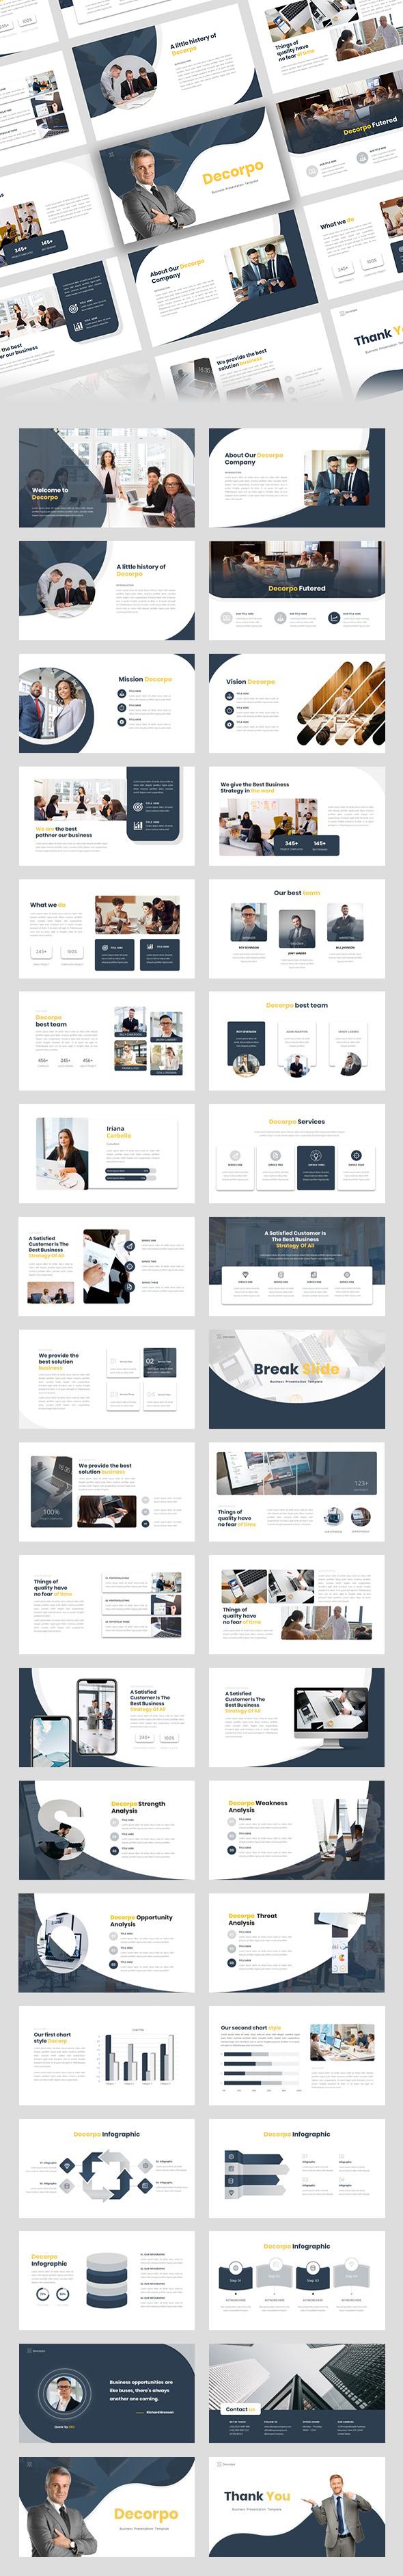 Decorpo - Business Presentation Template